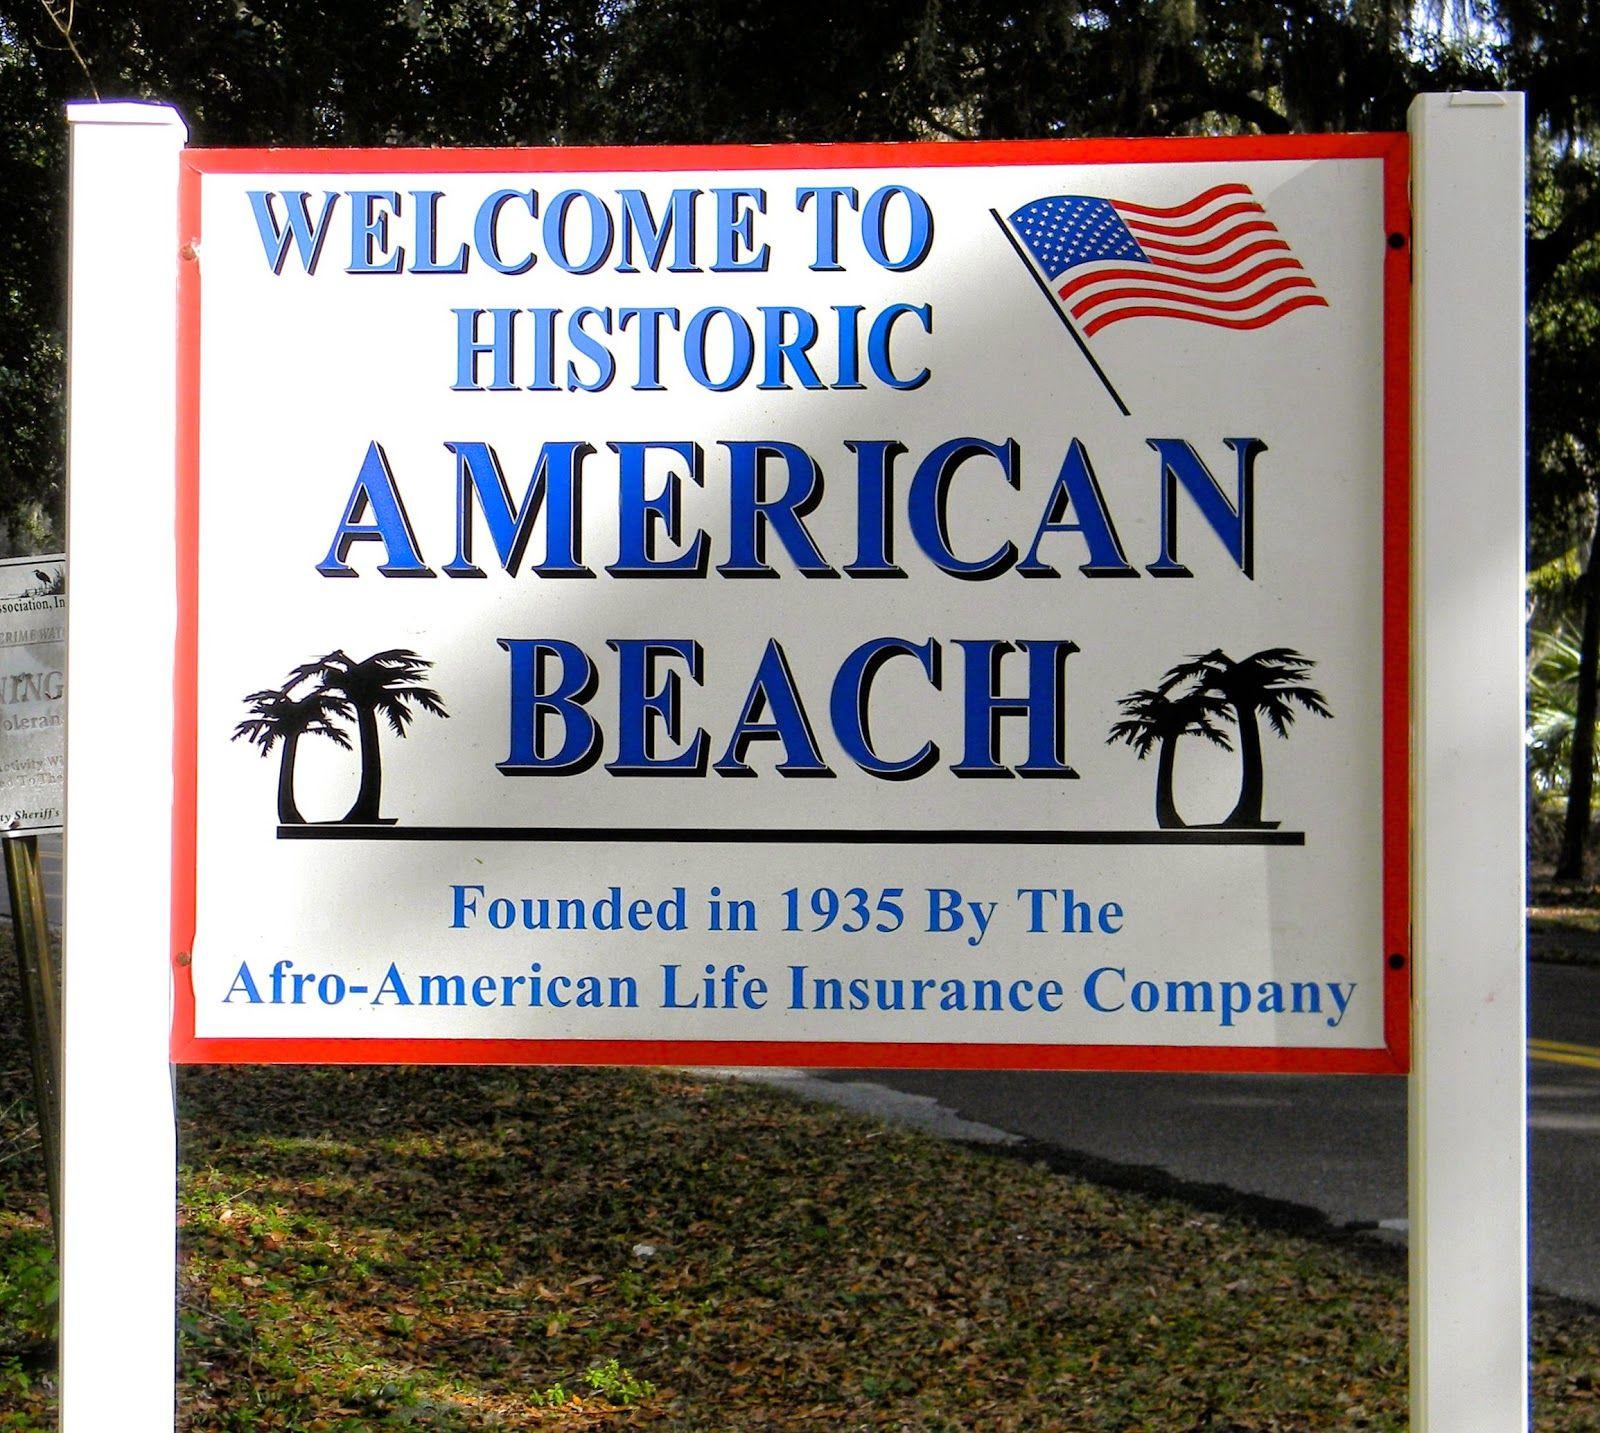 American Beach, Amelia Island, Florida American beaches